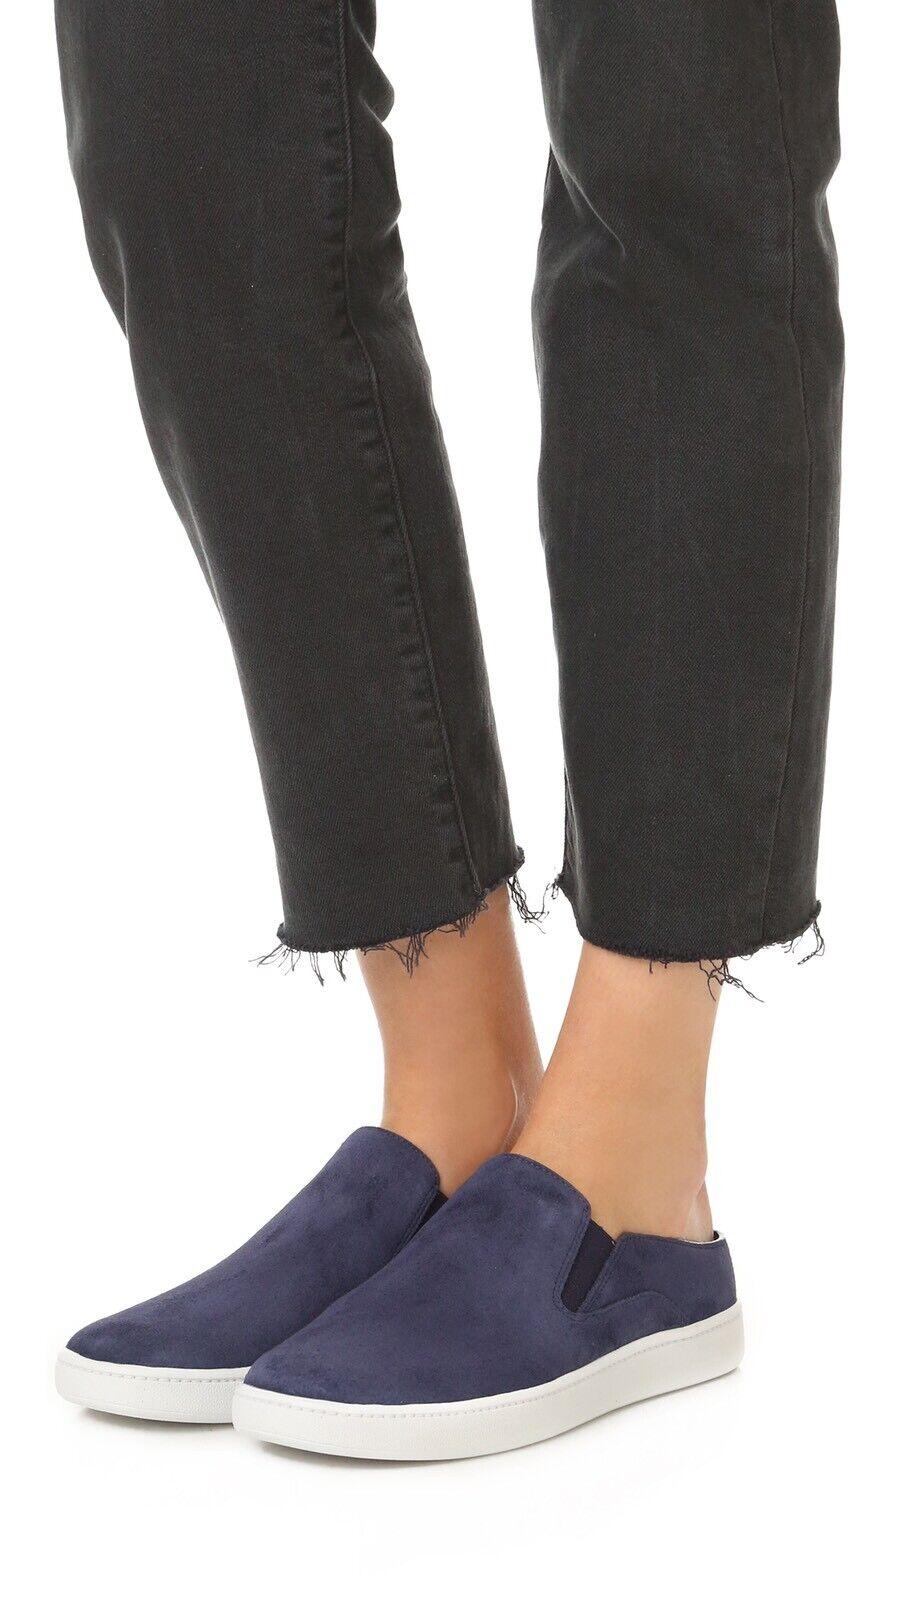 NIB Vince Verrell Slip On Sneakers Deep bluee Size 9